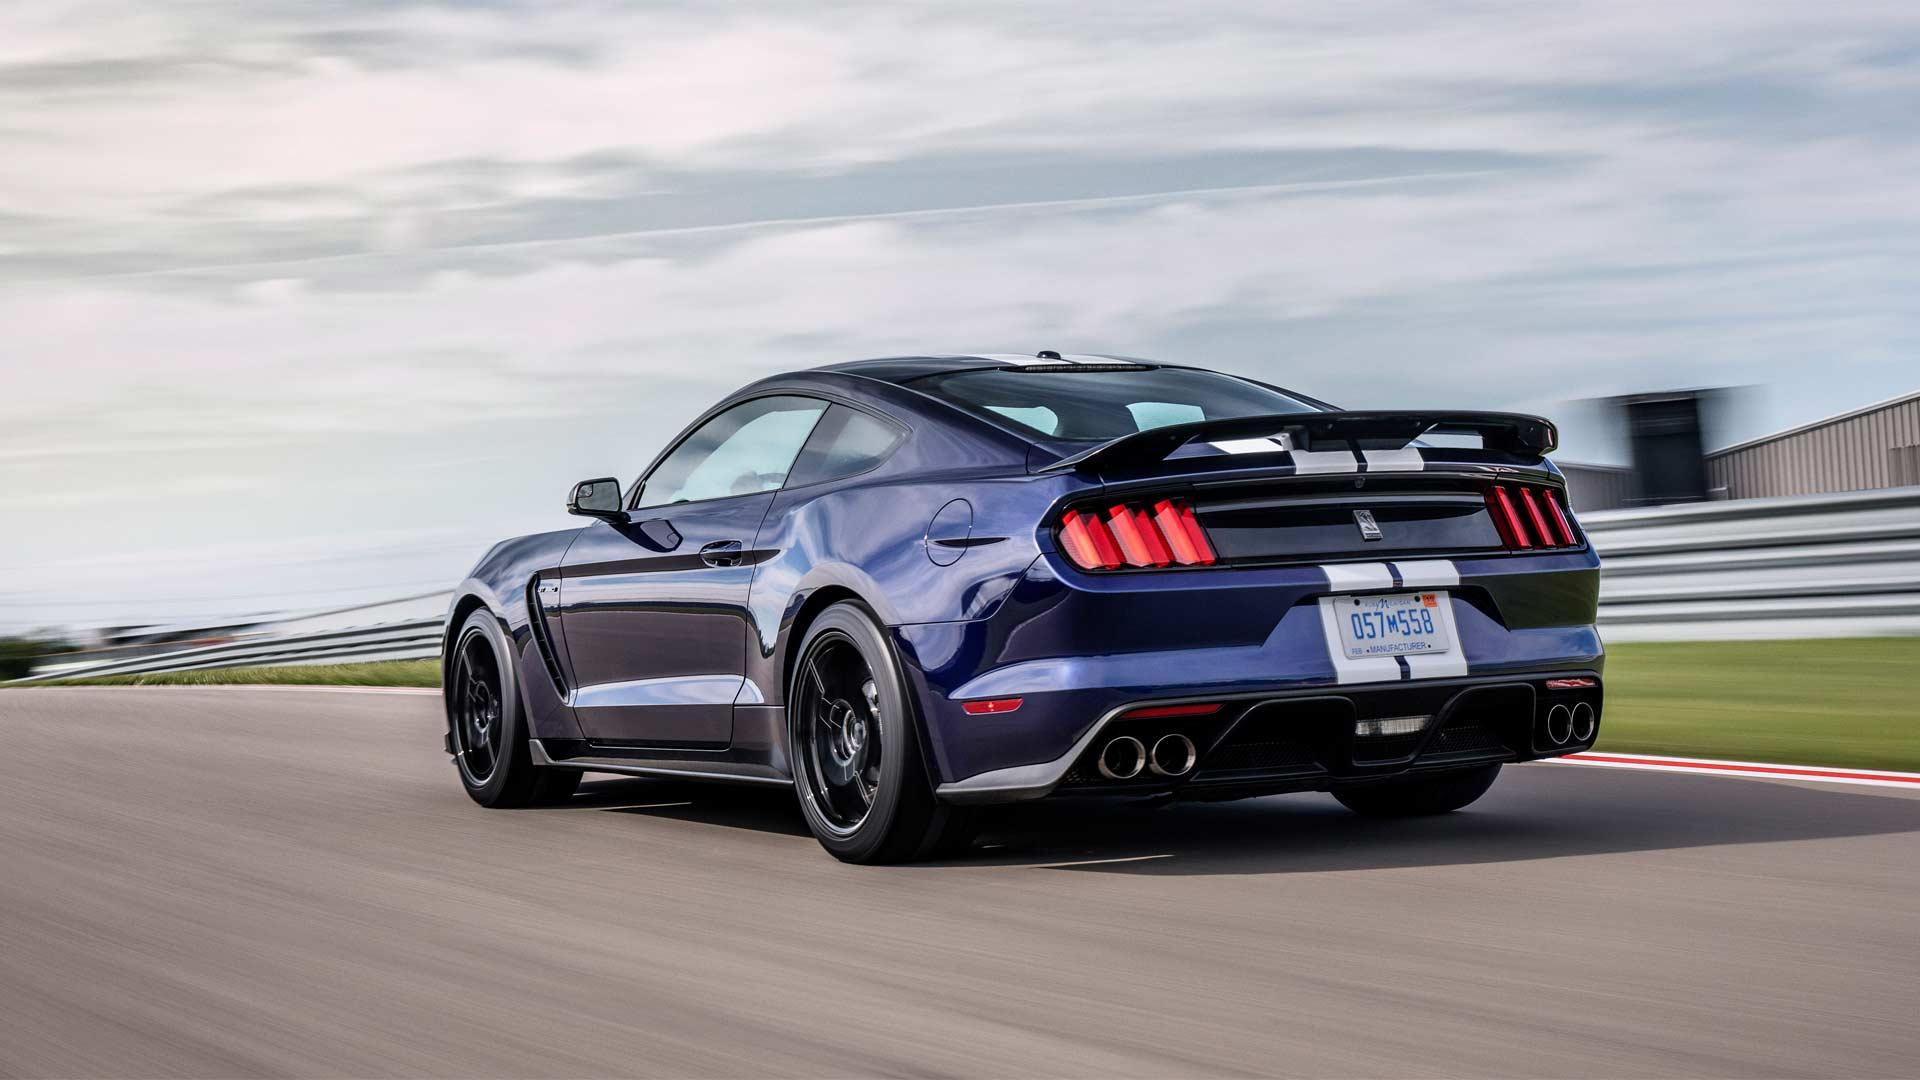 2019 Mustang Shelby GT350 revealed - Autodevot